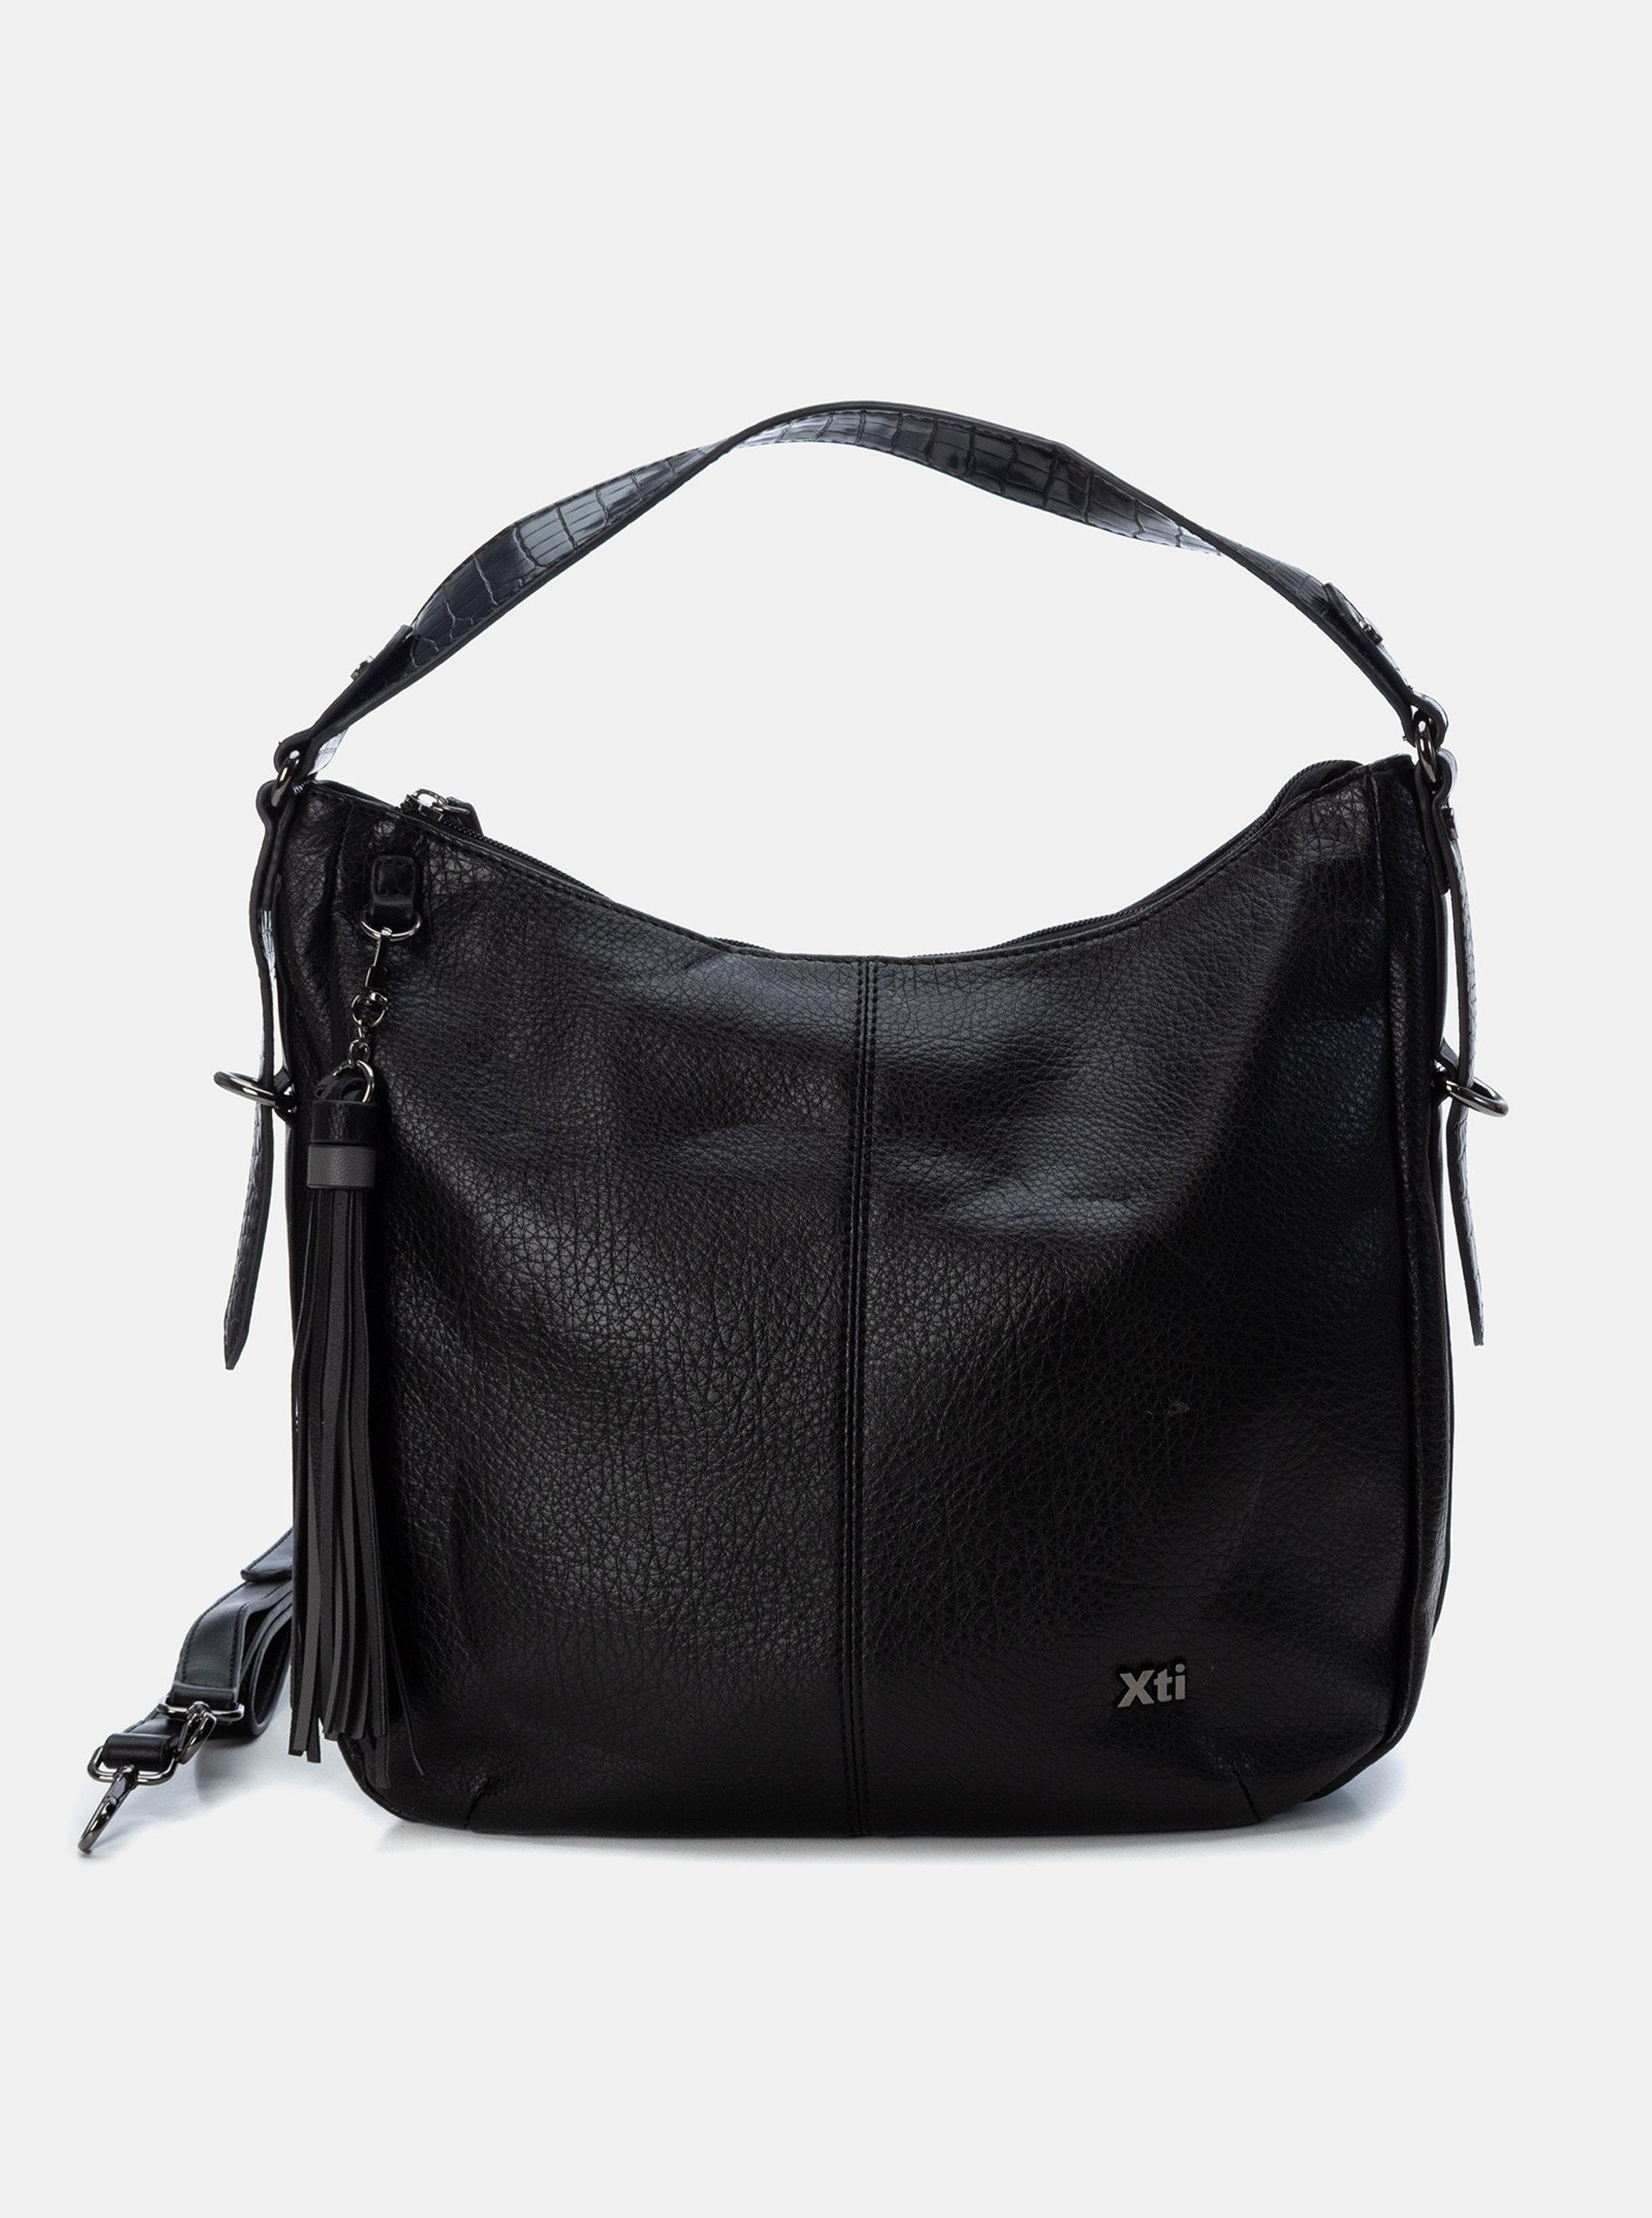 Černá kabelka s třásněmi Xti